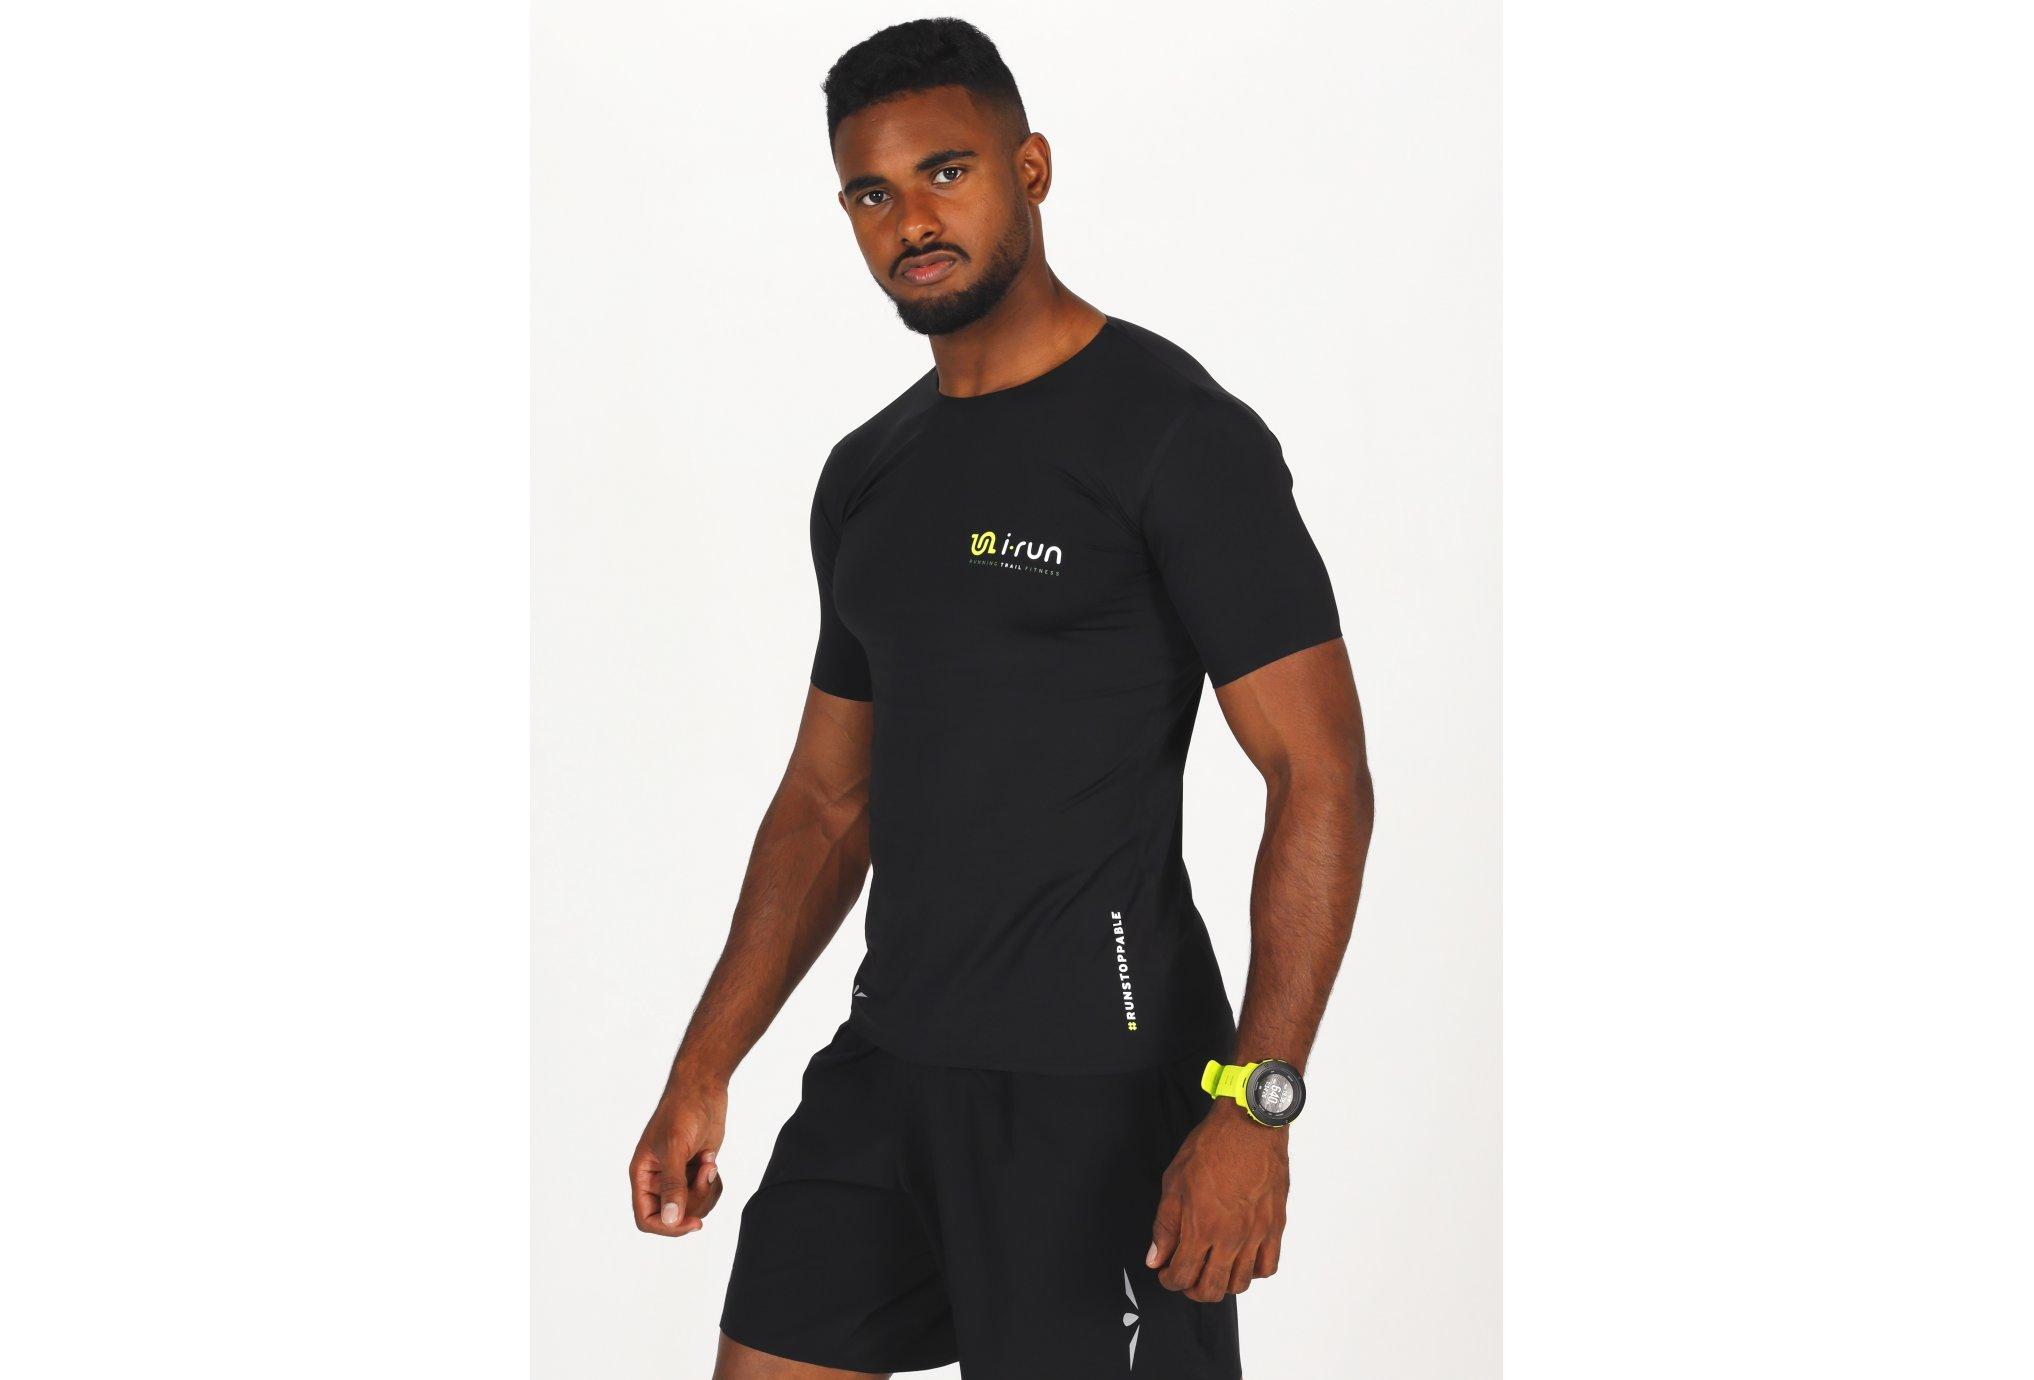 i-run.fr Base Special i-Run M vêtement running homme